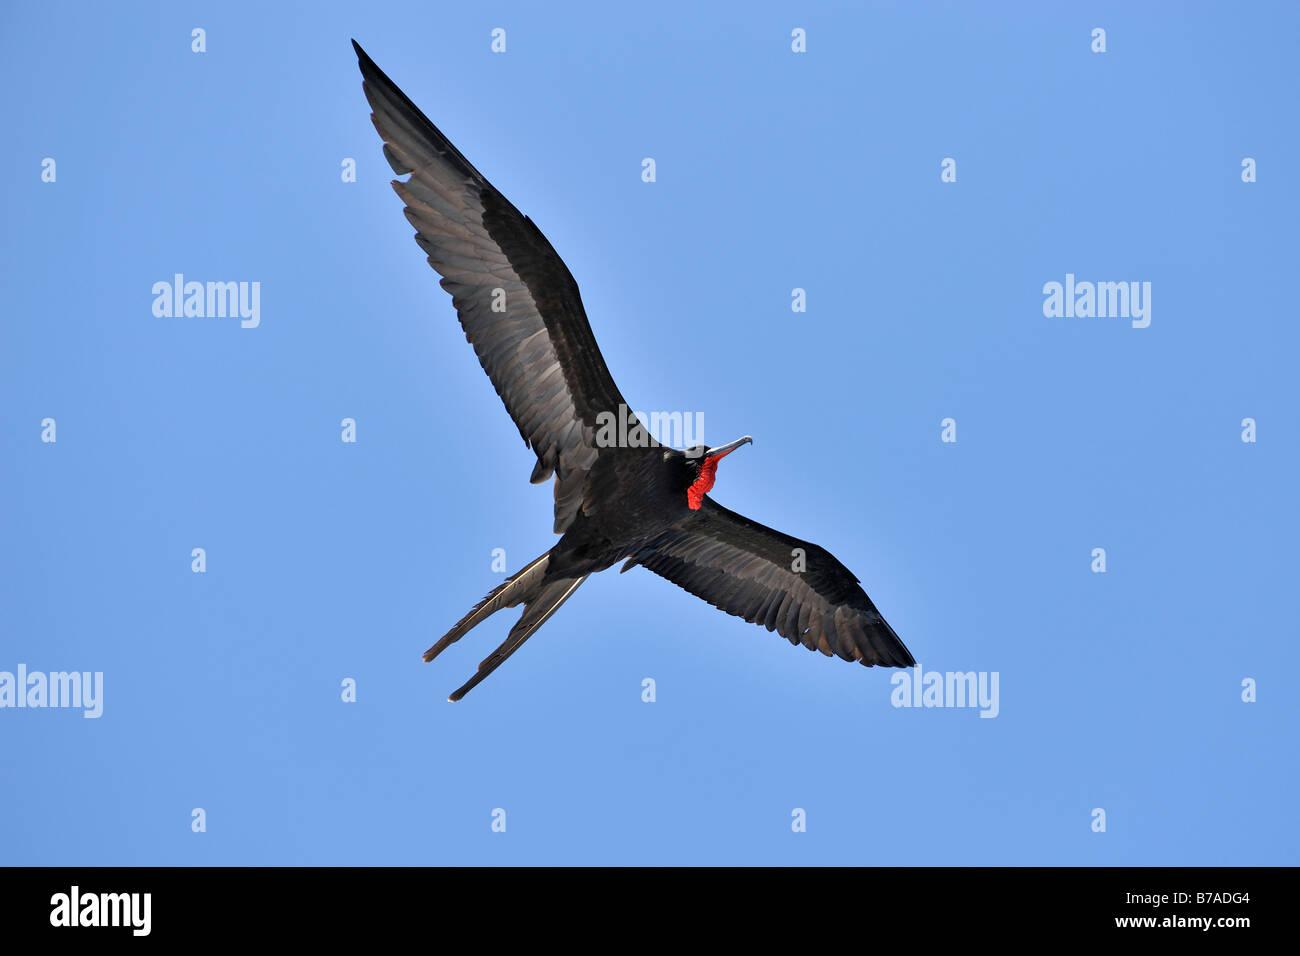 Great Frigatebird (Fregata minor) in flight, Galapagos Islands, Ecuador, South America - Stock Image